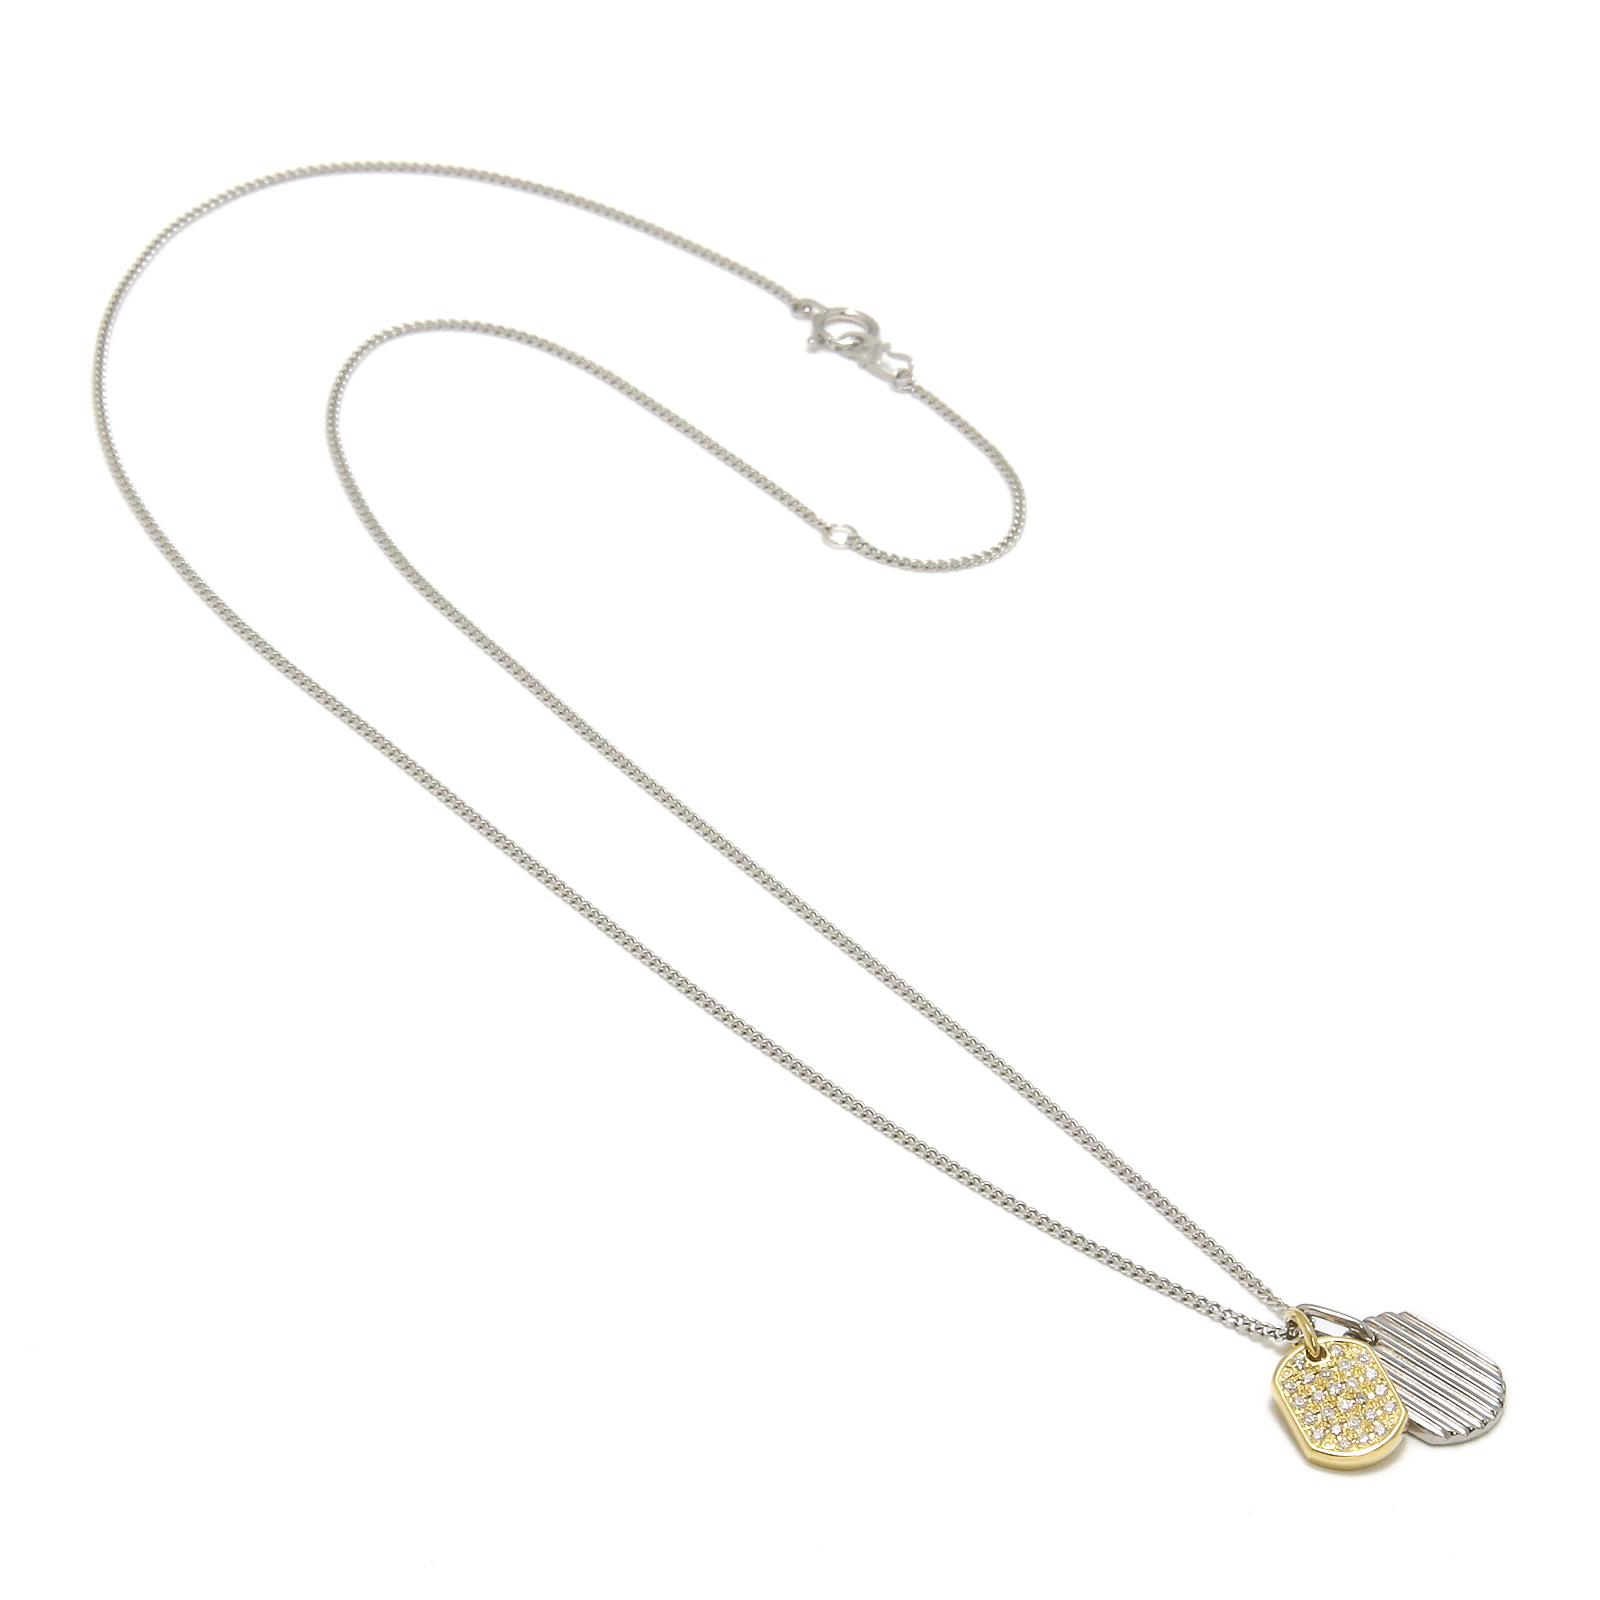 2018 Christmas Model Small Dog Tag Necklace - K18Yellow Gold × Pt900 w/Diamond